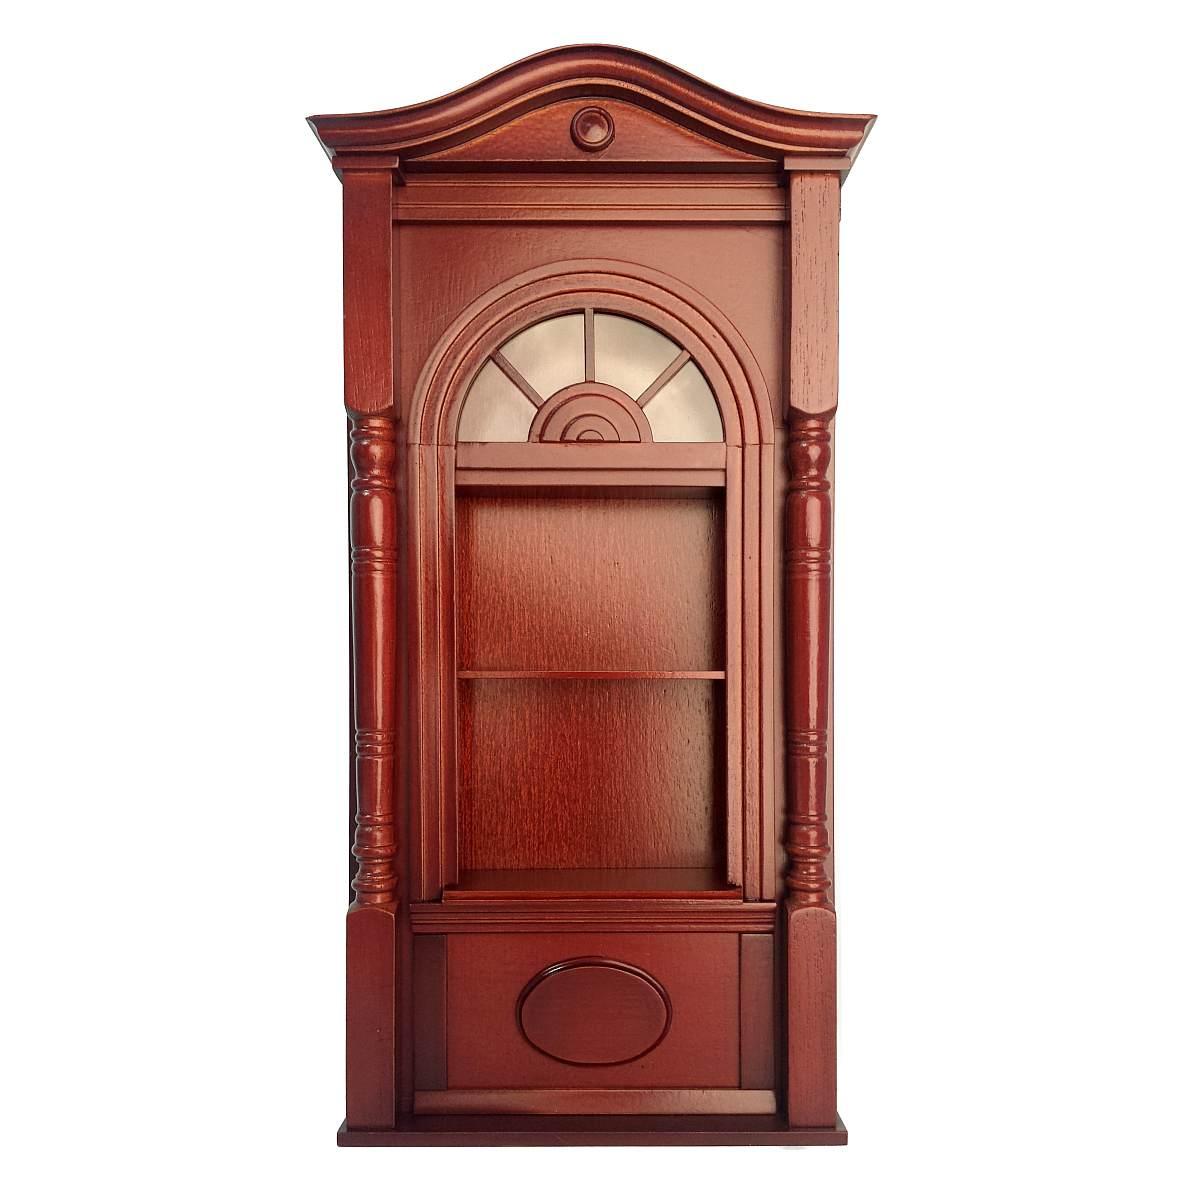 offener schrank mit gesims 95025. Black Bedroom Furniture Sets. Home Design Ideas